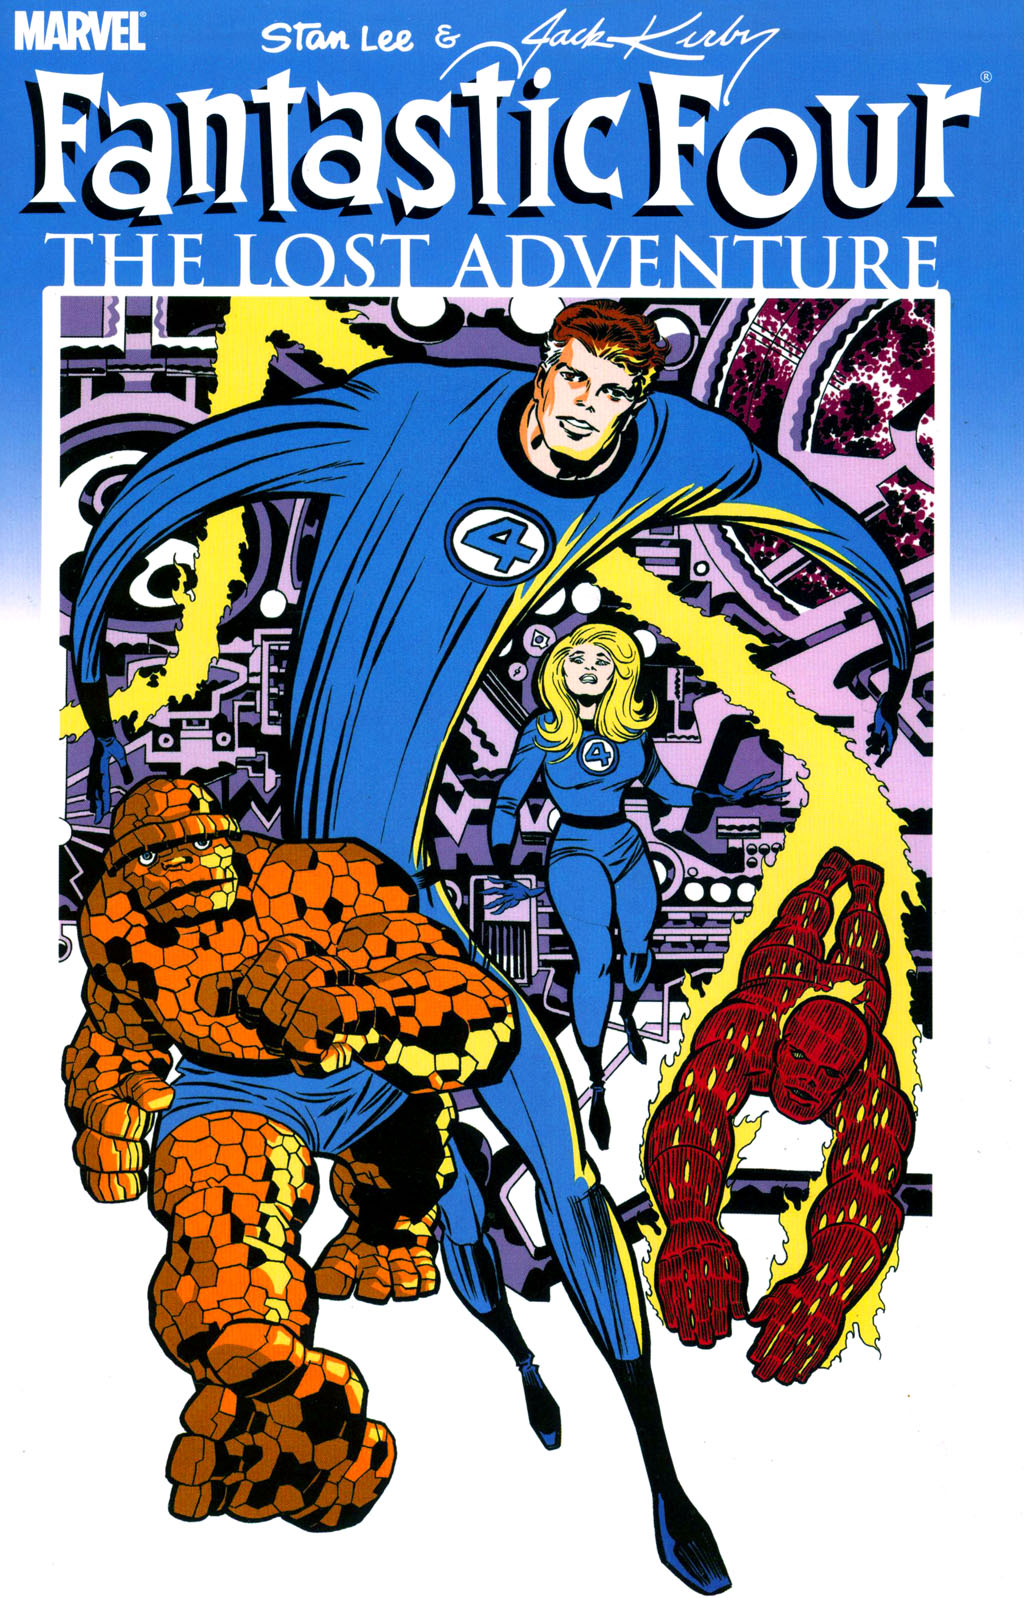 Fantastic Four The Lost Adventure Vol 1 1